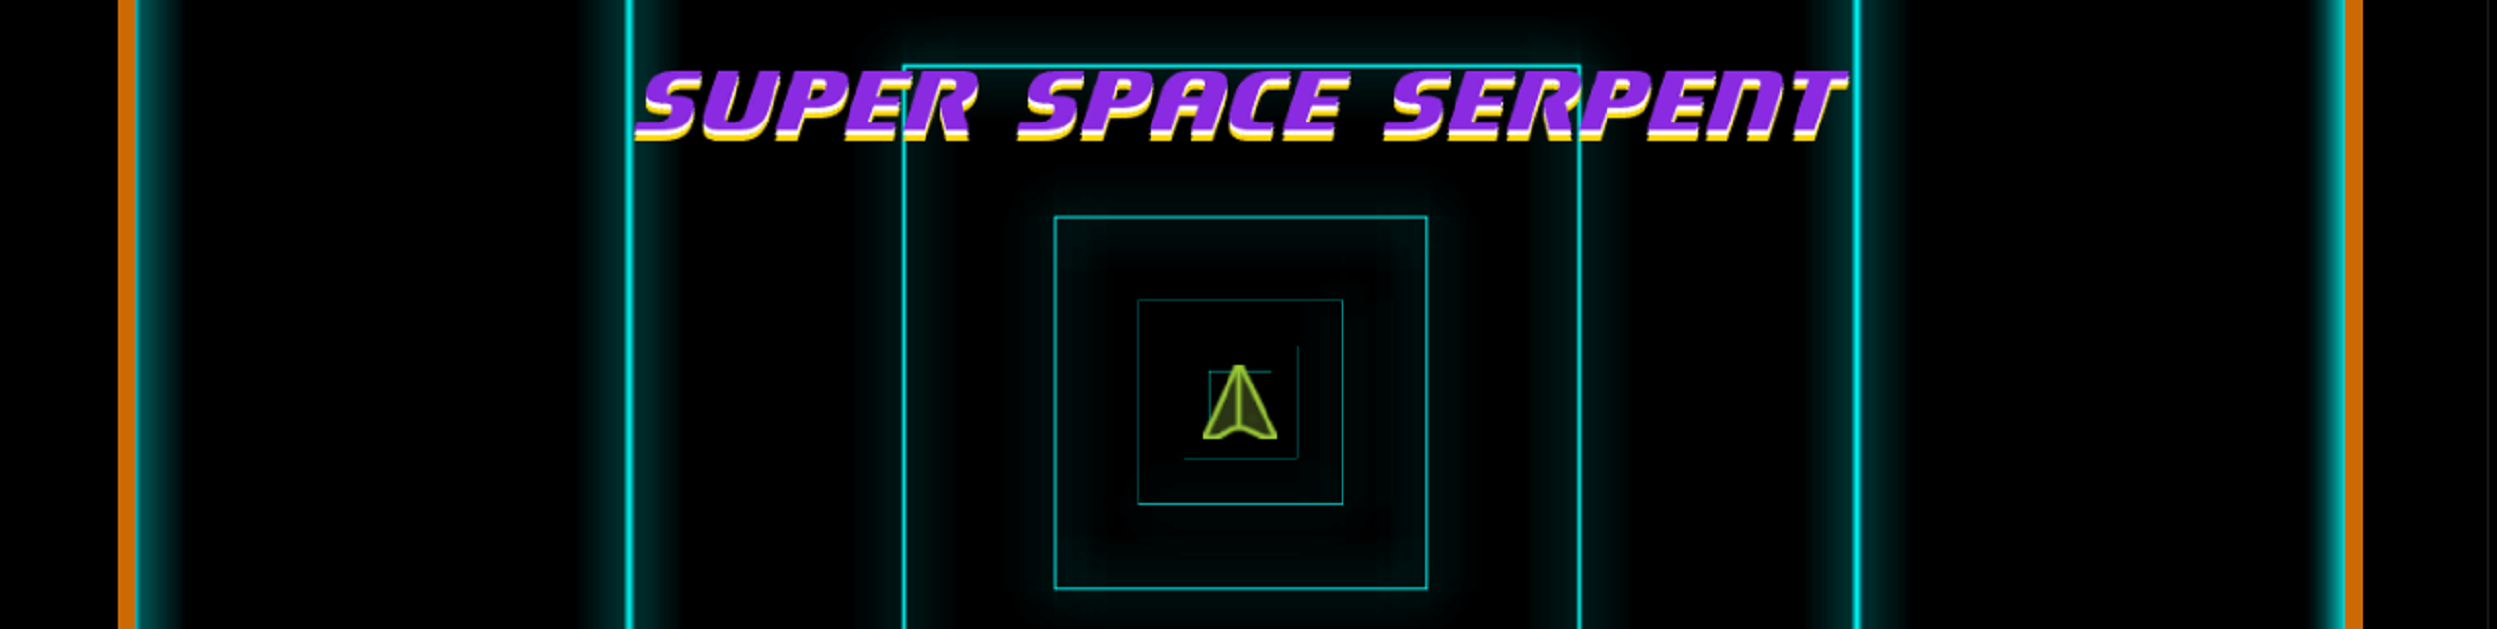 Super Space Serpent